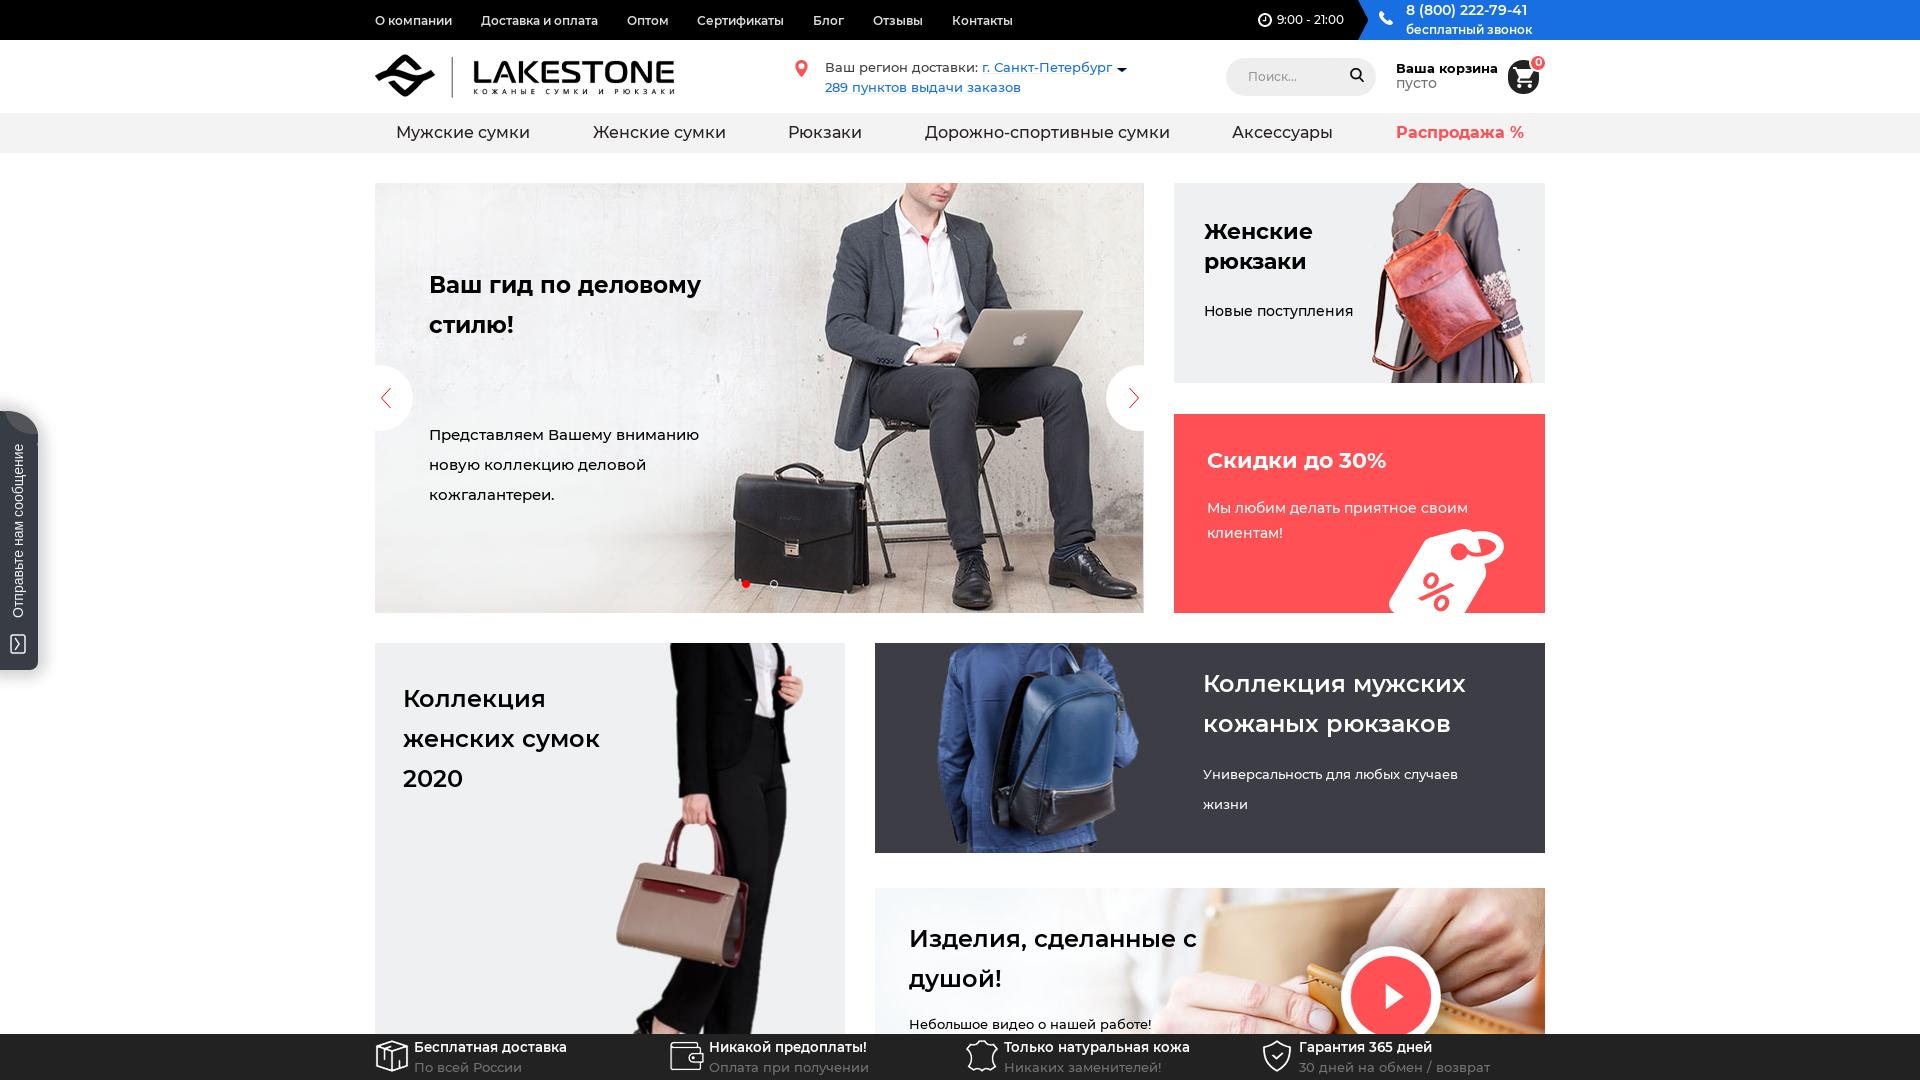 Lakestone website